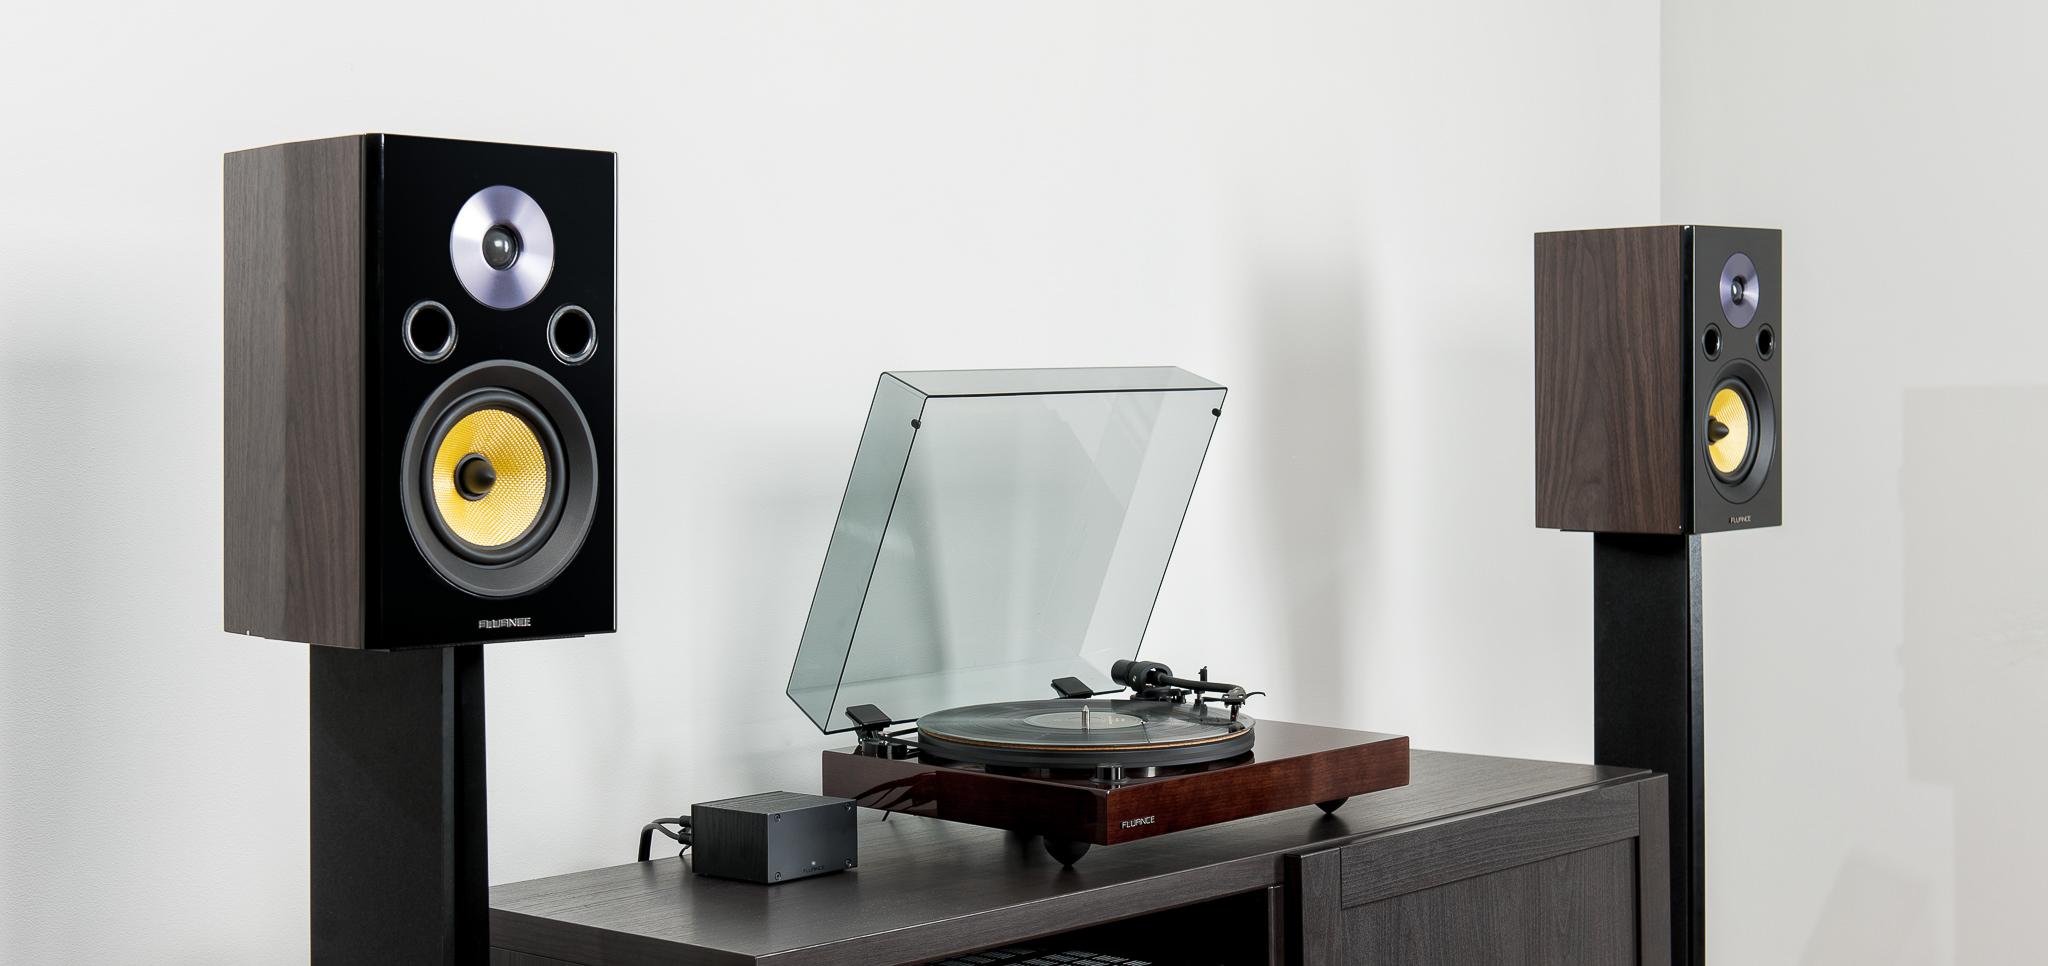 Ported Vs Sealed Speakers